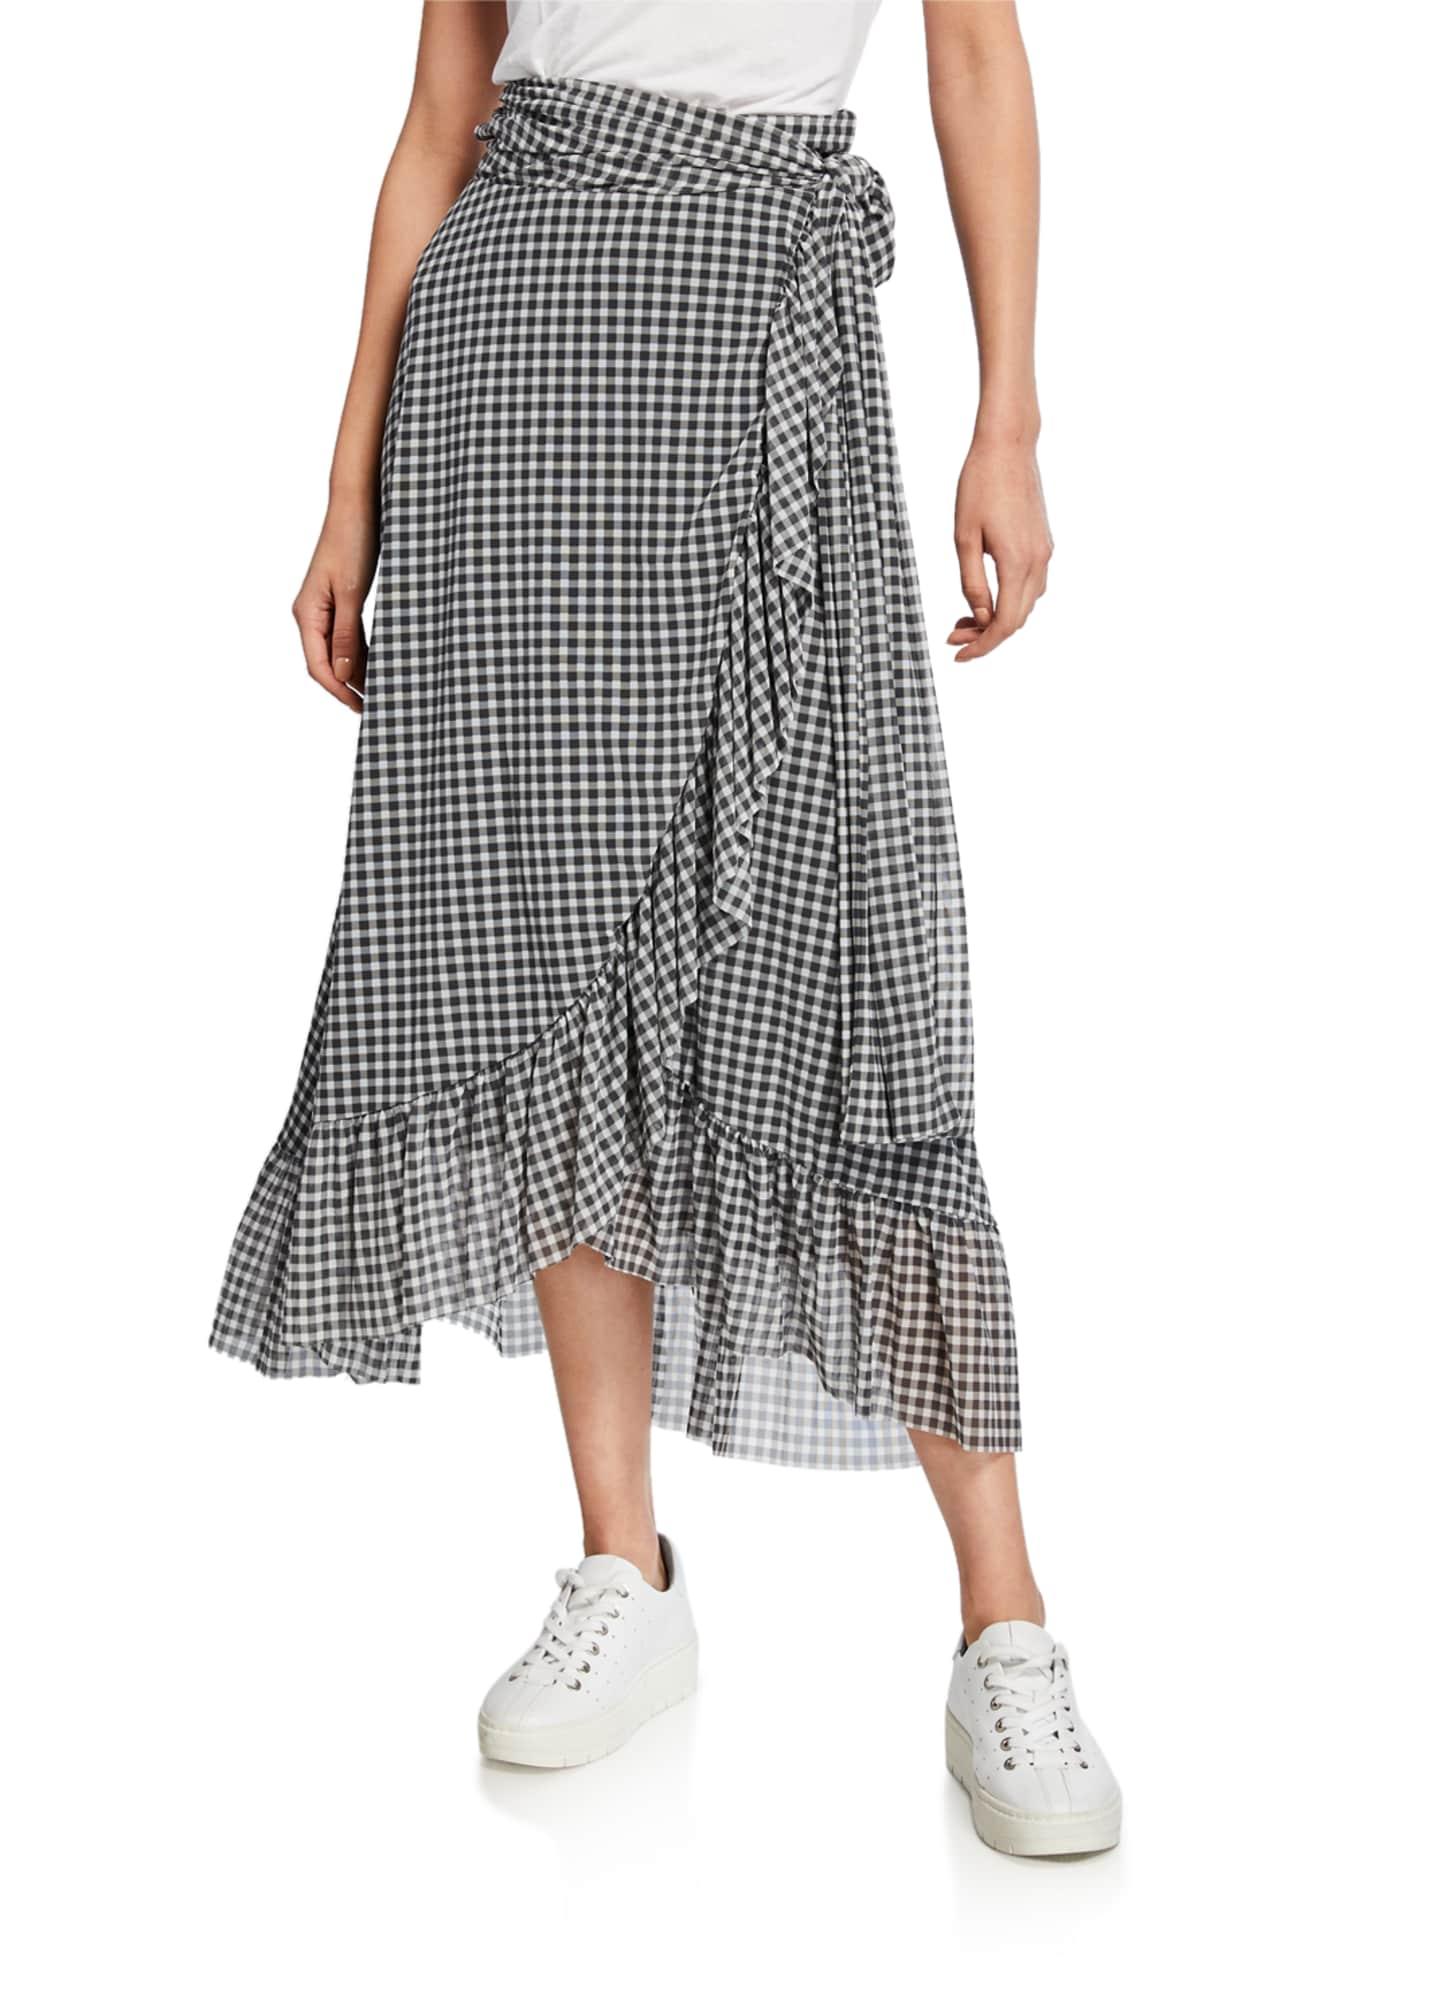 Ganni Gingham Crepe Maxi Skirt